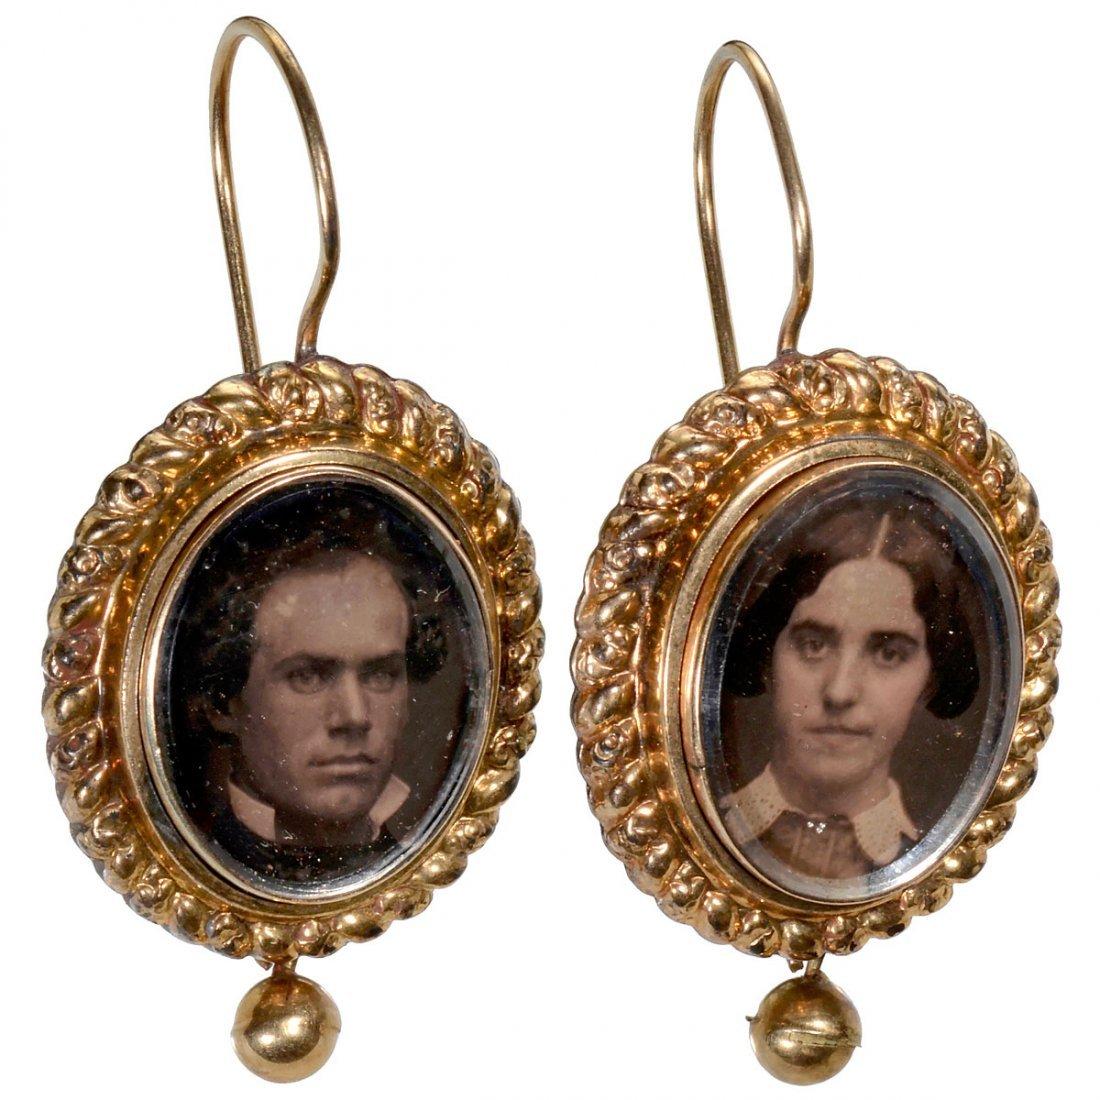 Earrings with Daguerreotypes, c. 1850